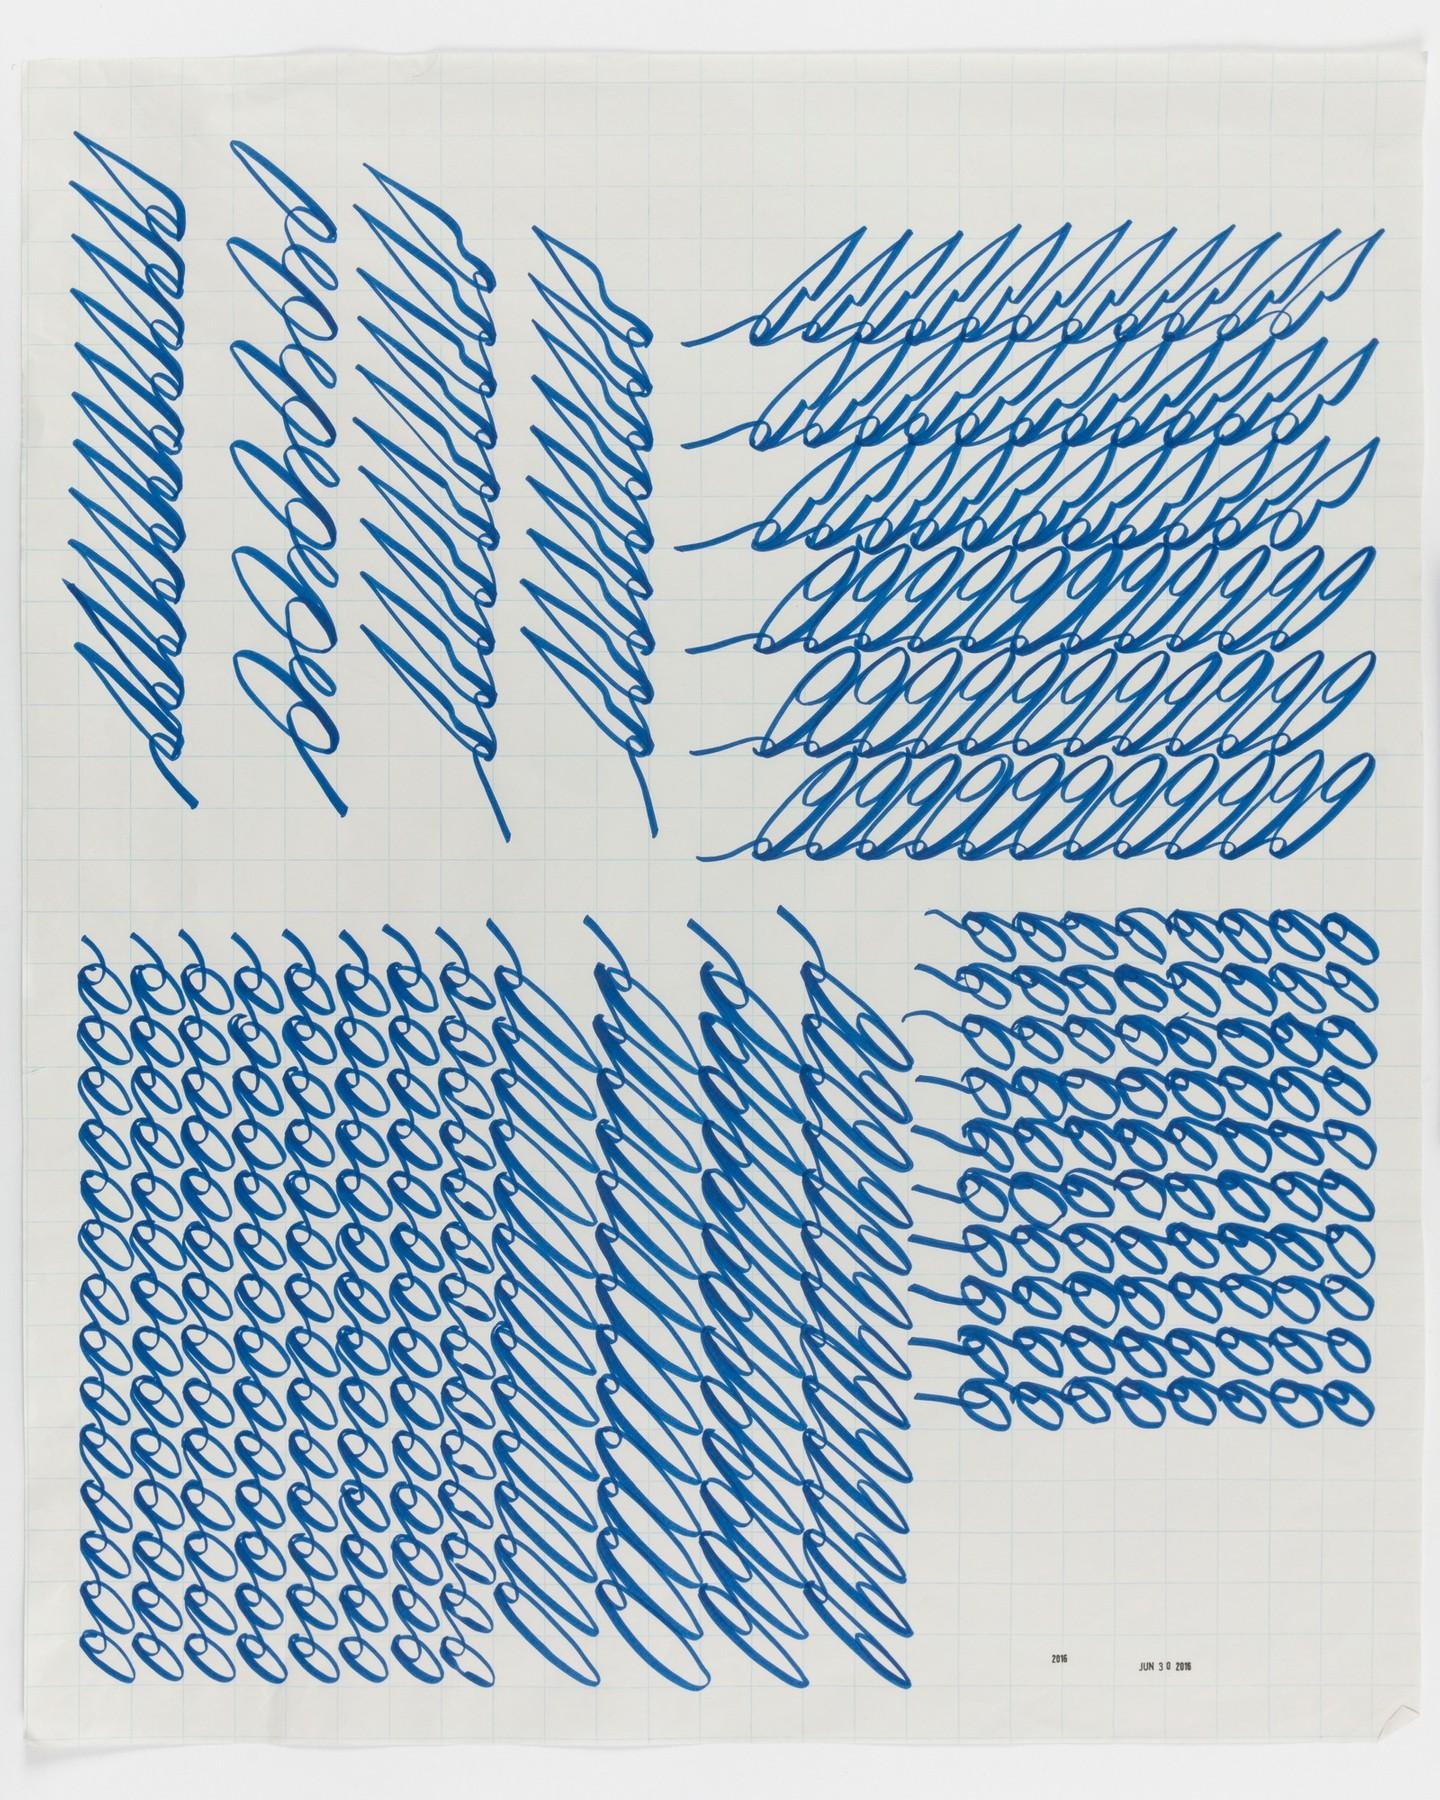 0646-ligature-drawing-30-june-2016-tauba-auerbach-large.jpg